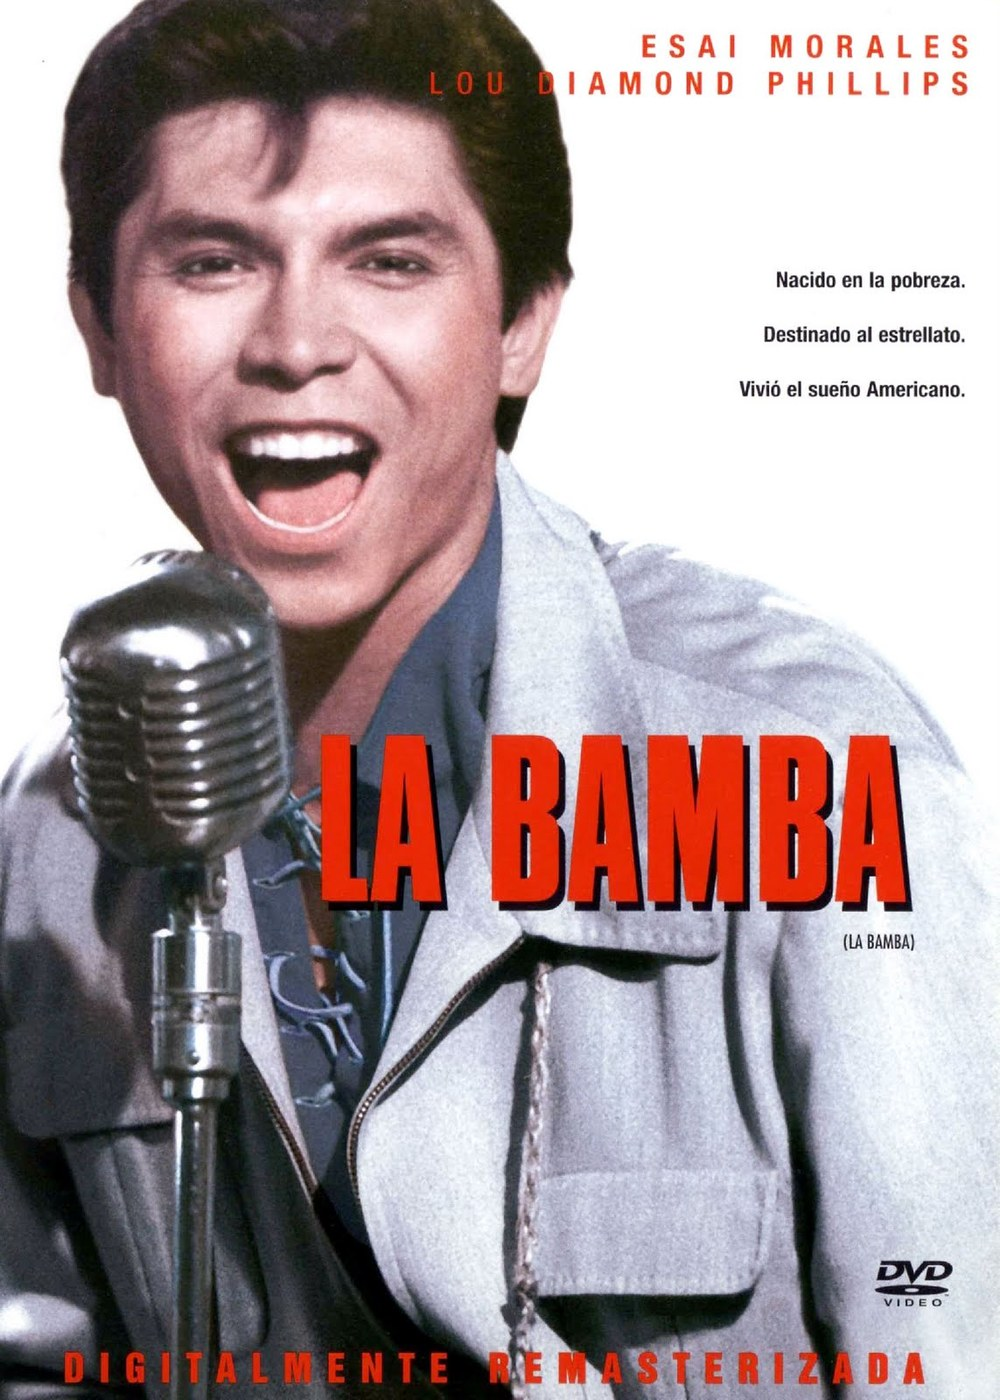 La bamba, Dir. Luis Valdez